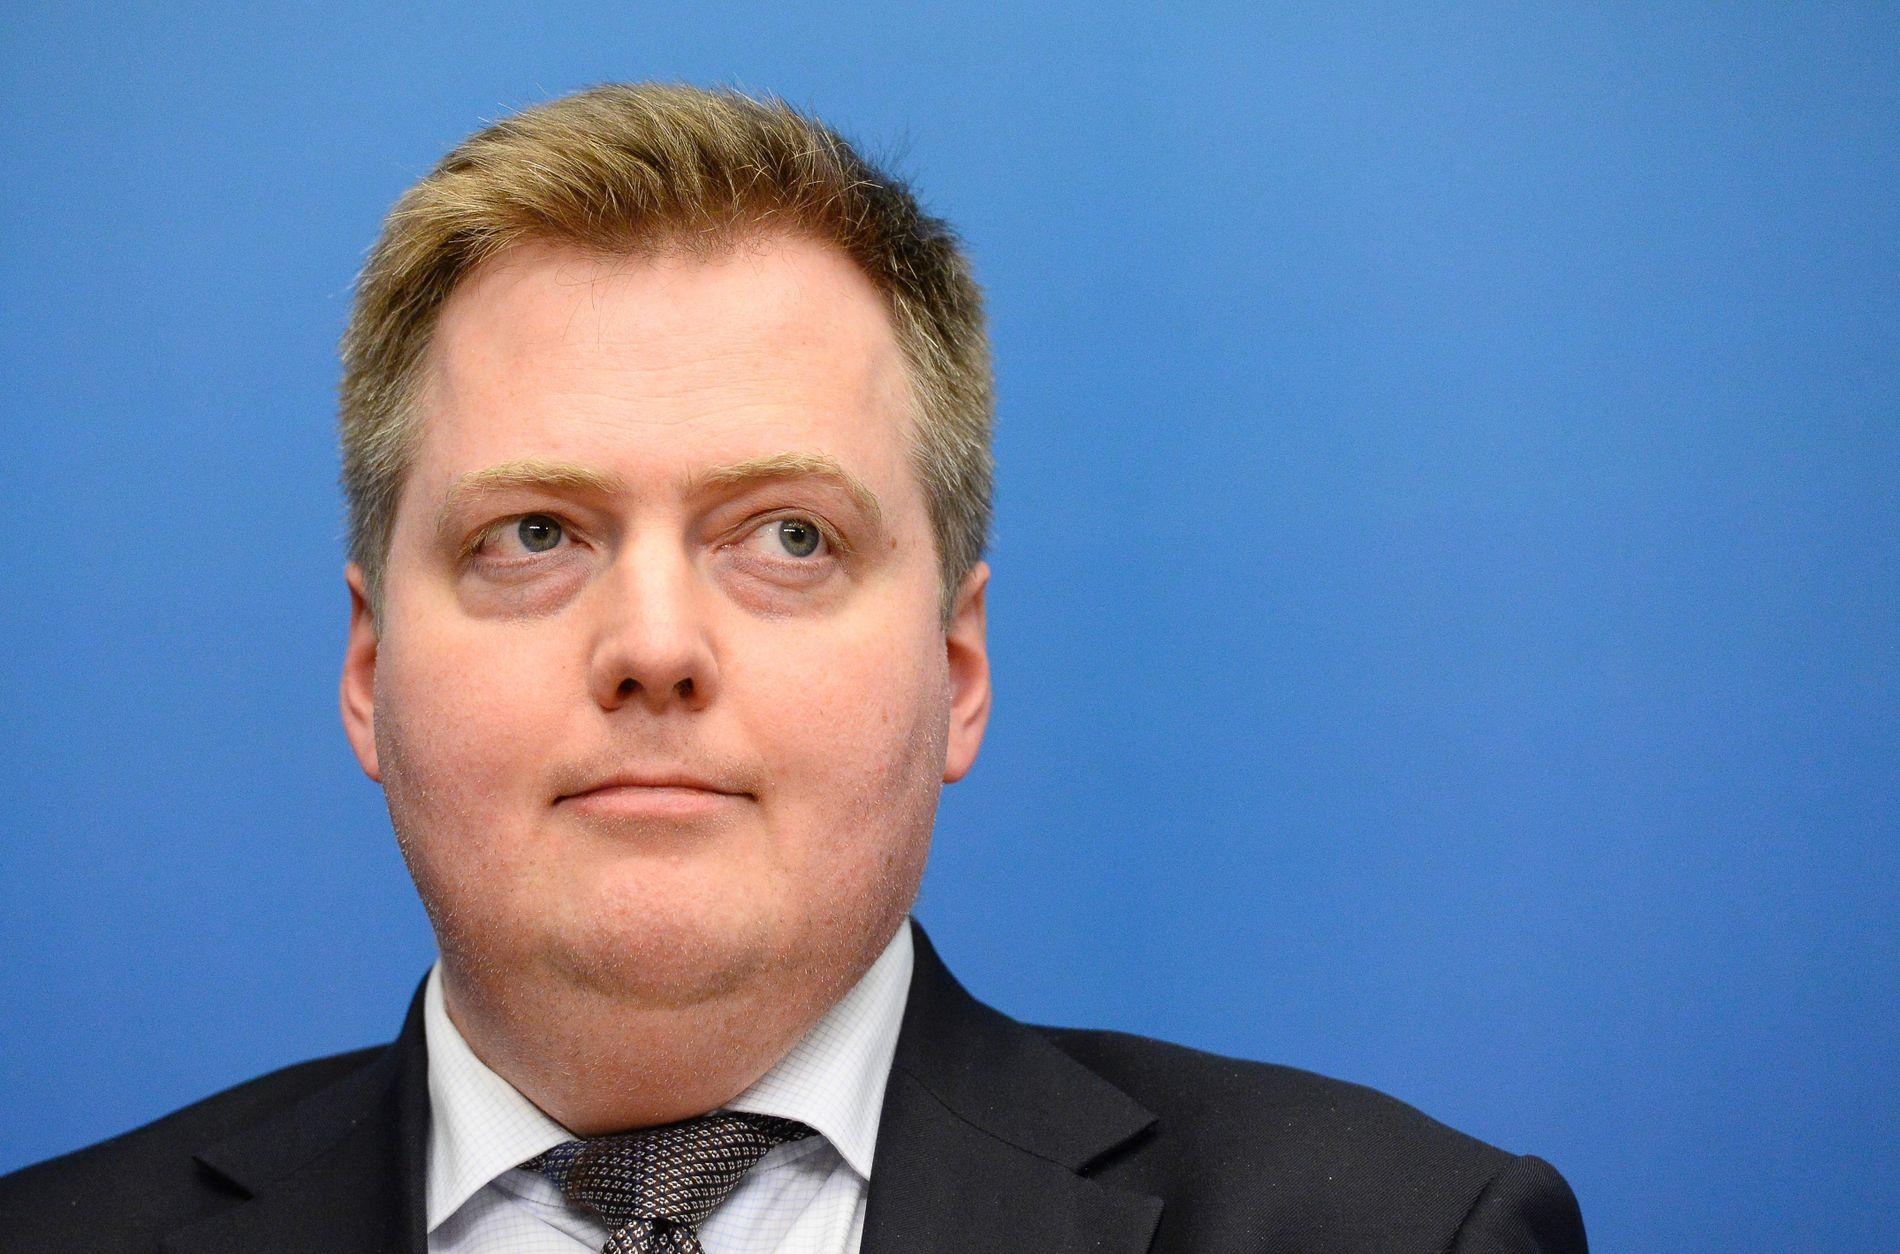 HARDT PRESSET: Den islandske statsministeren, Sigmundur Davíð Gunnlaugsson, er hardt presset fra både politikere og folket på sagaøya. Her er han avbildet på et møte i Nordisk Råd i 2014. Foto AFP / JONATHAN NACKSTRAND